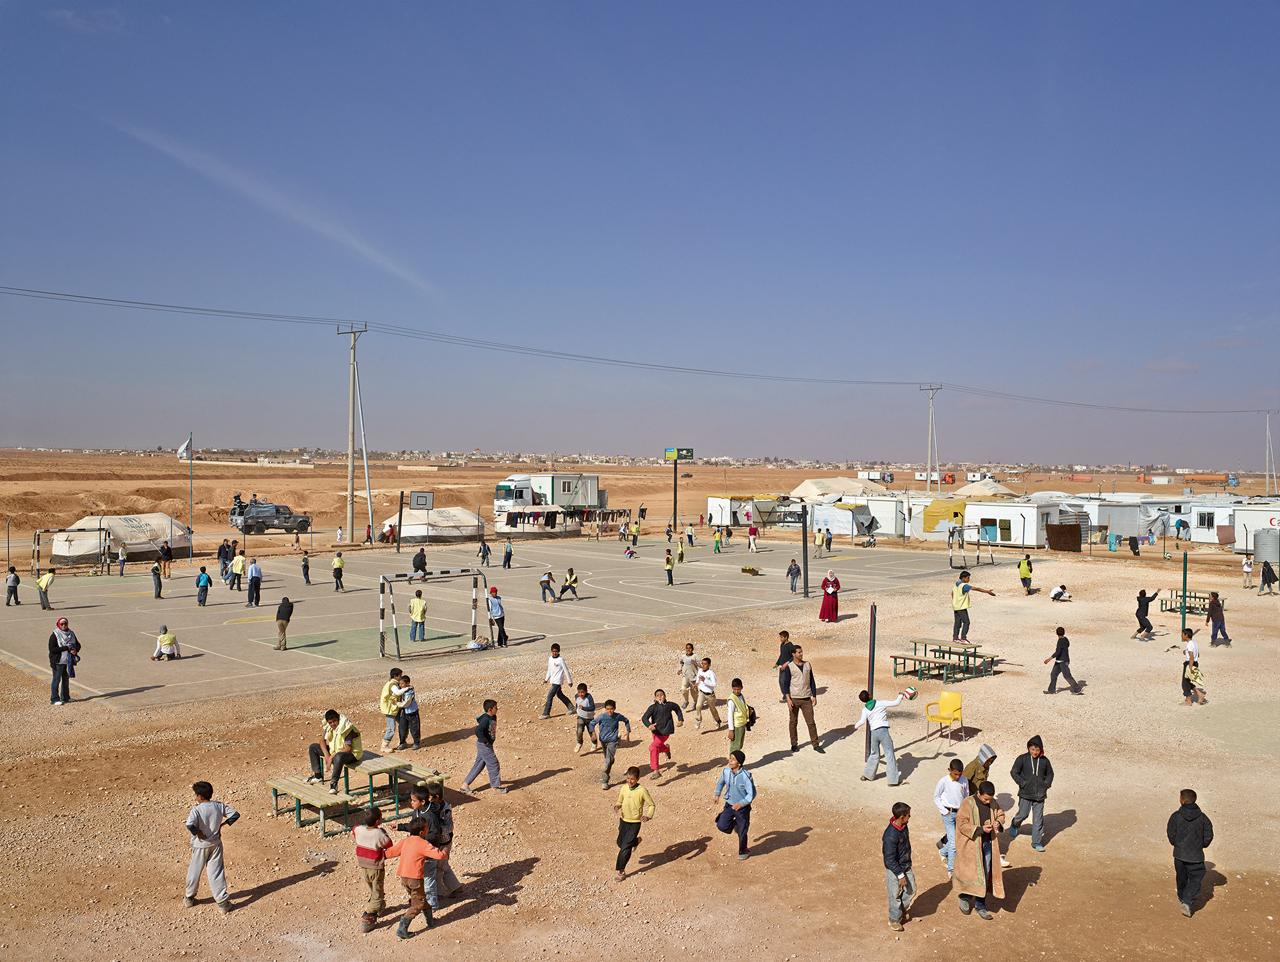 JAMES MOLLISON,  Adolescent Safe Space, Site 5 District 12, Zaatari Refugee Camp, Jordan,  January 23, 2014